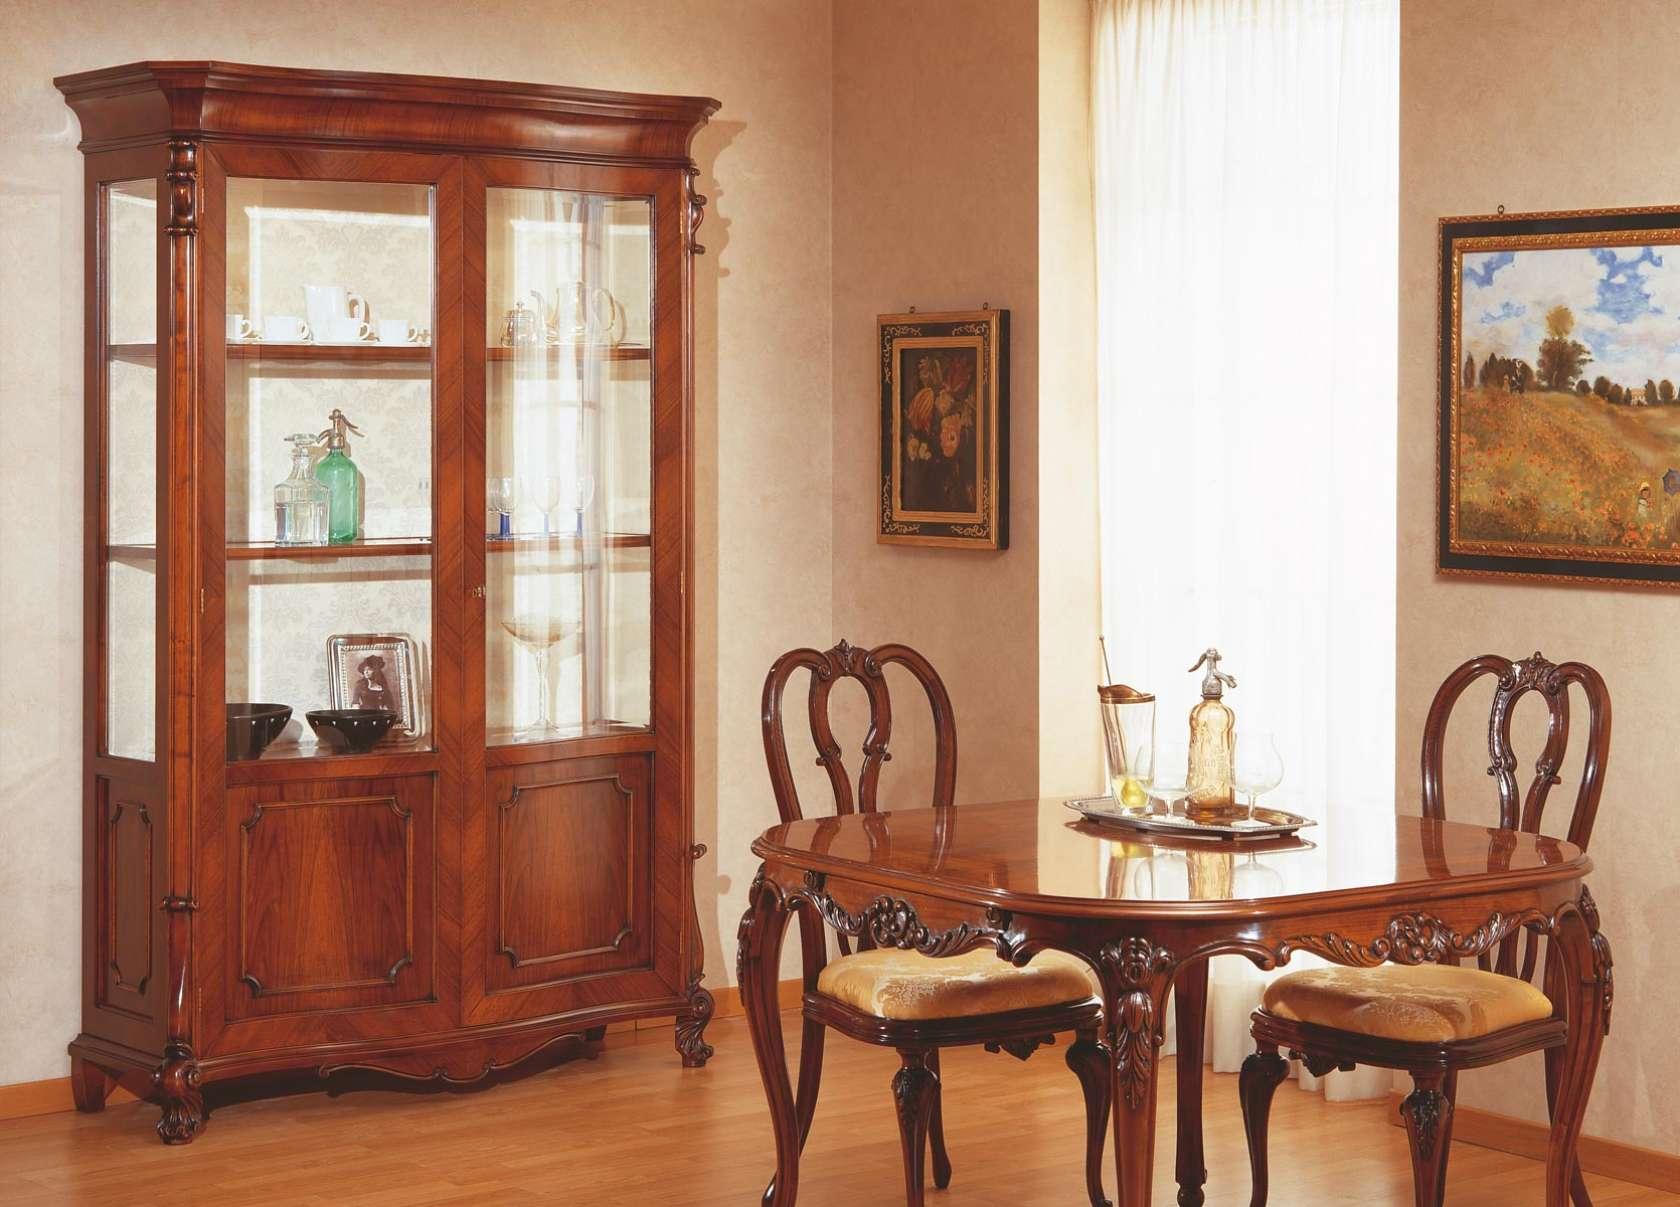 18th century siciliano table and glass showcase